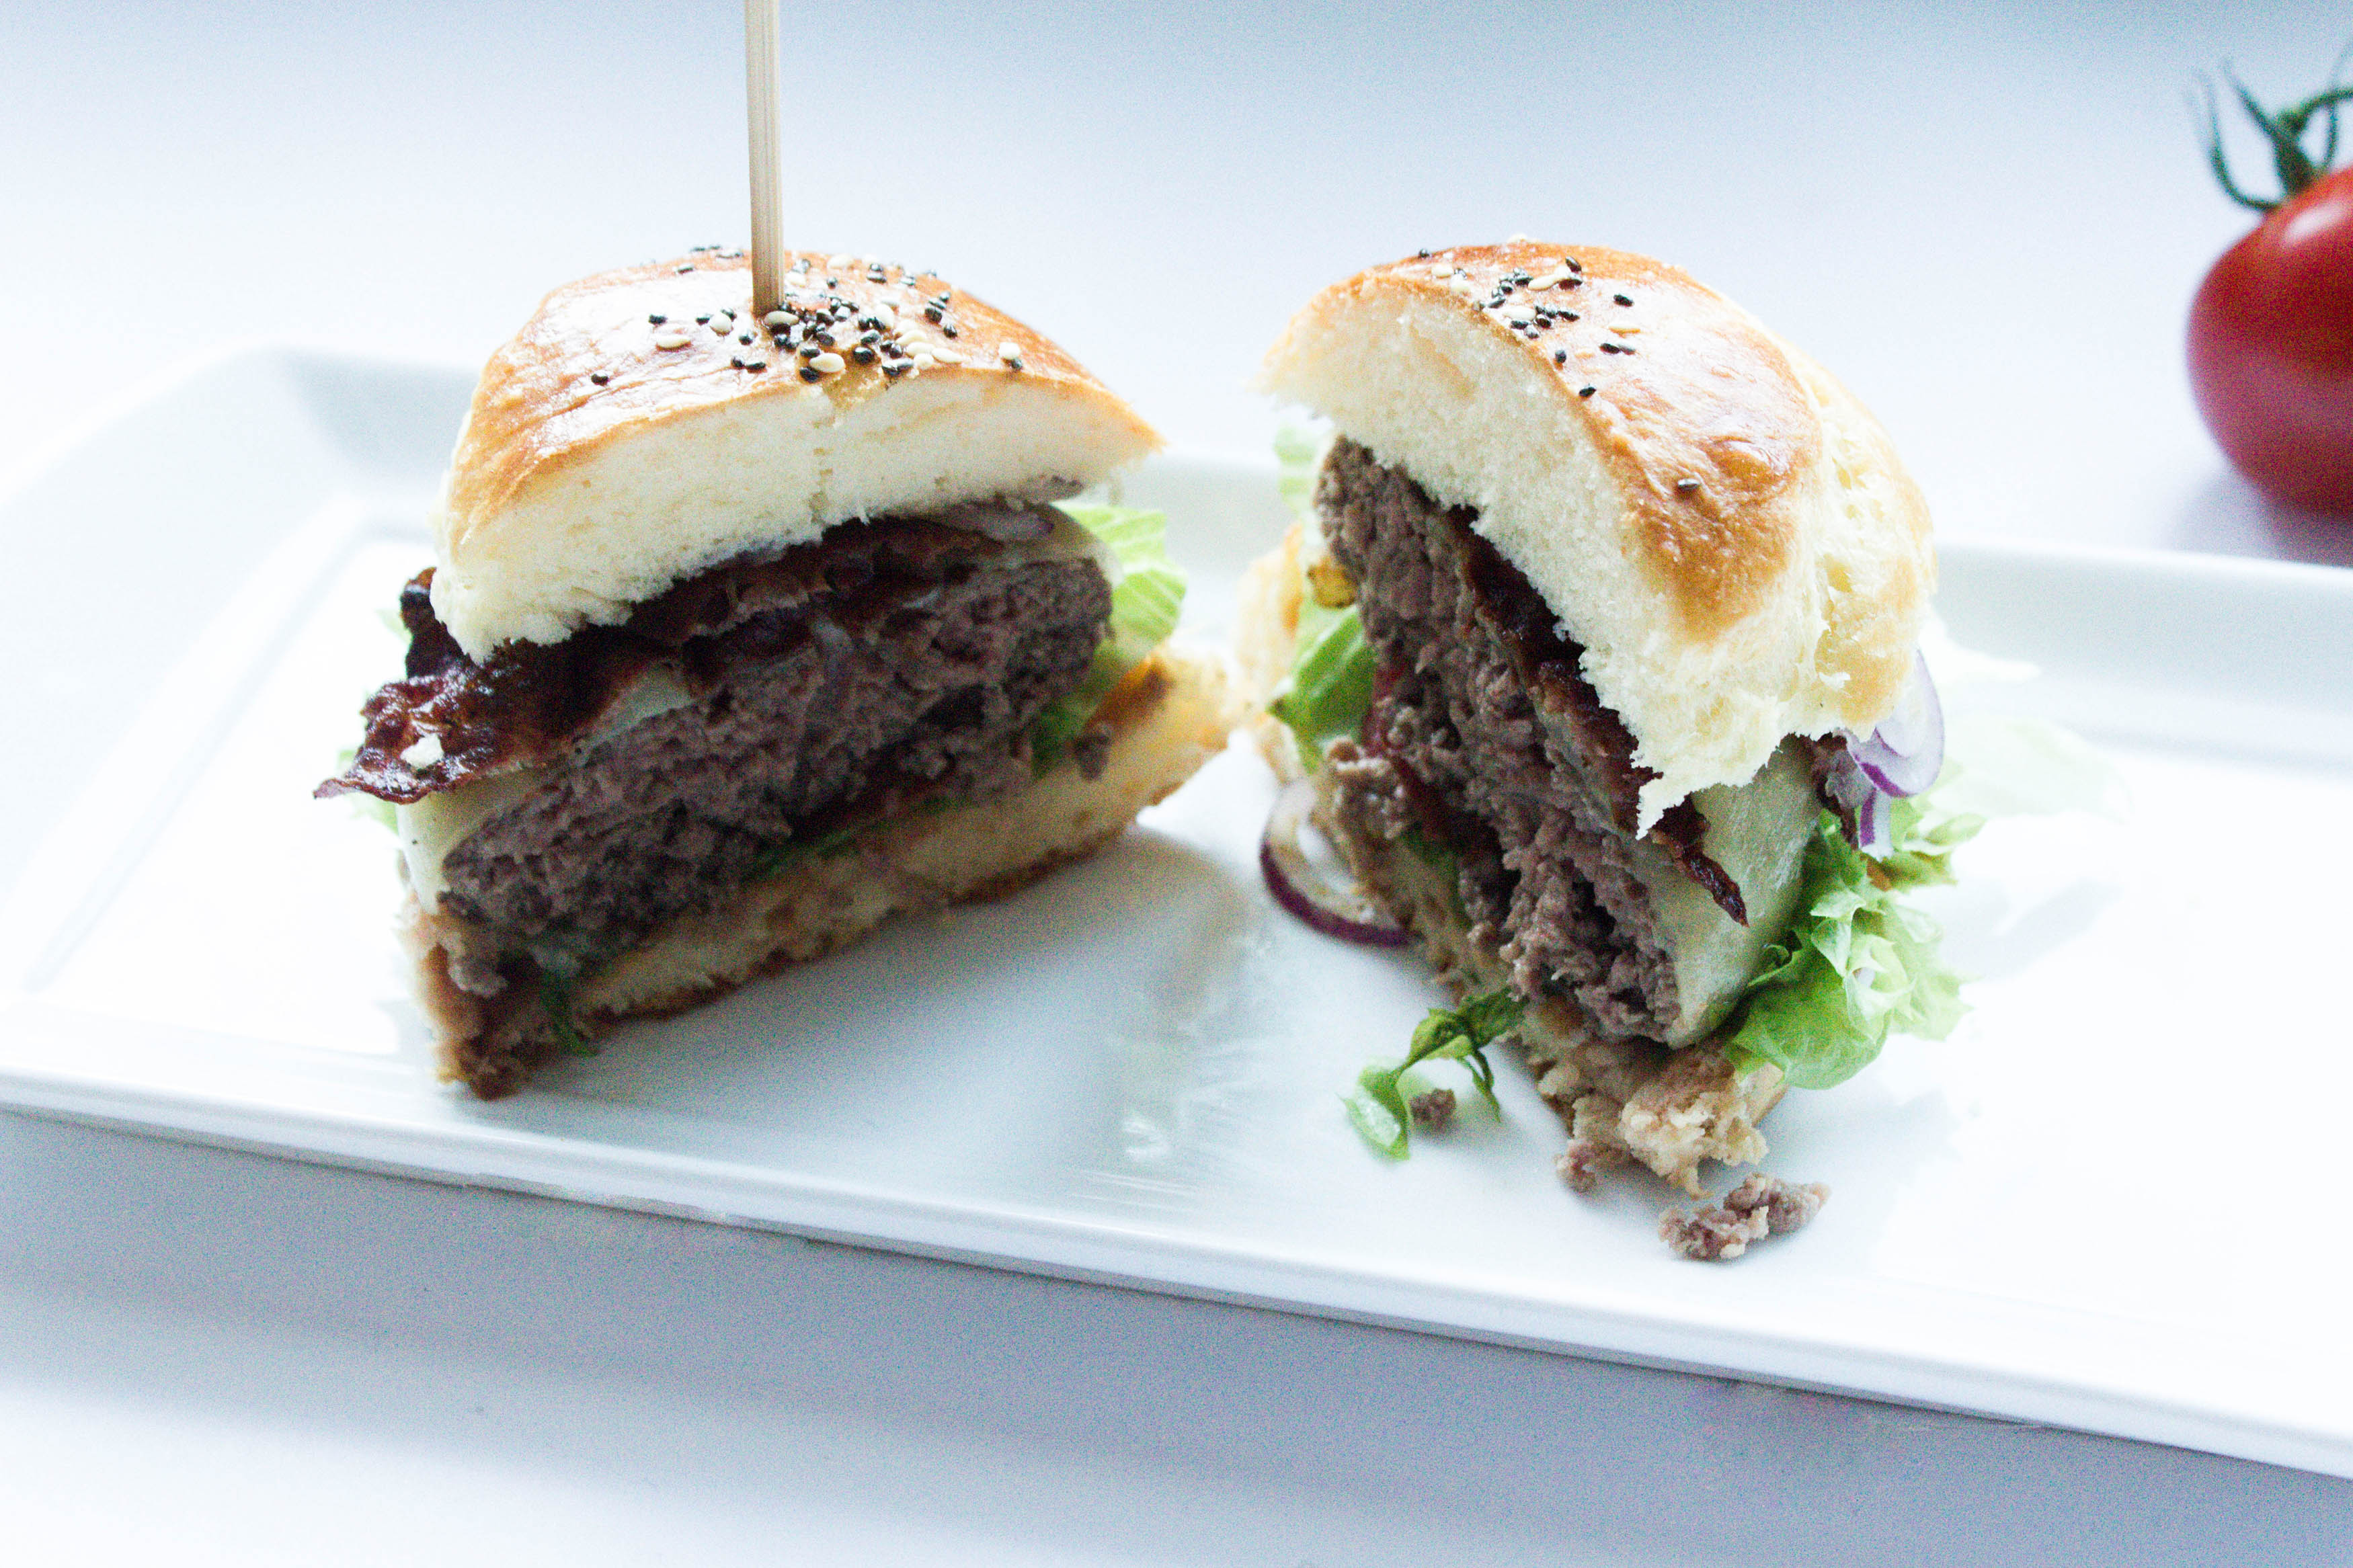 IHEARTALICE.DE – Fashion, Travel, Lifestyle & Food-Blog by Alice M. Huynh from Berlin/Germany: Dreierlei Mini-Burger: Klassischer Burger, Low Carb Pilz Burger, Veggie Burger & Selbstgemachte Burger-Brötchen / Rezept by Yvi Huynh